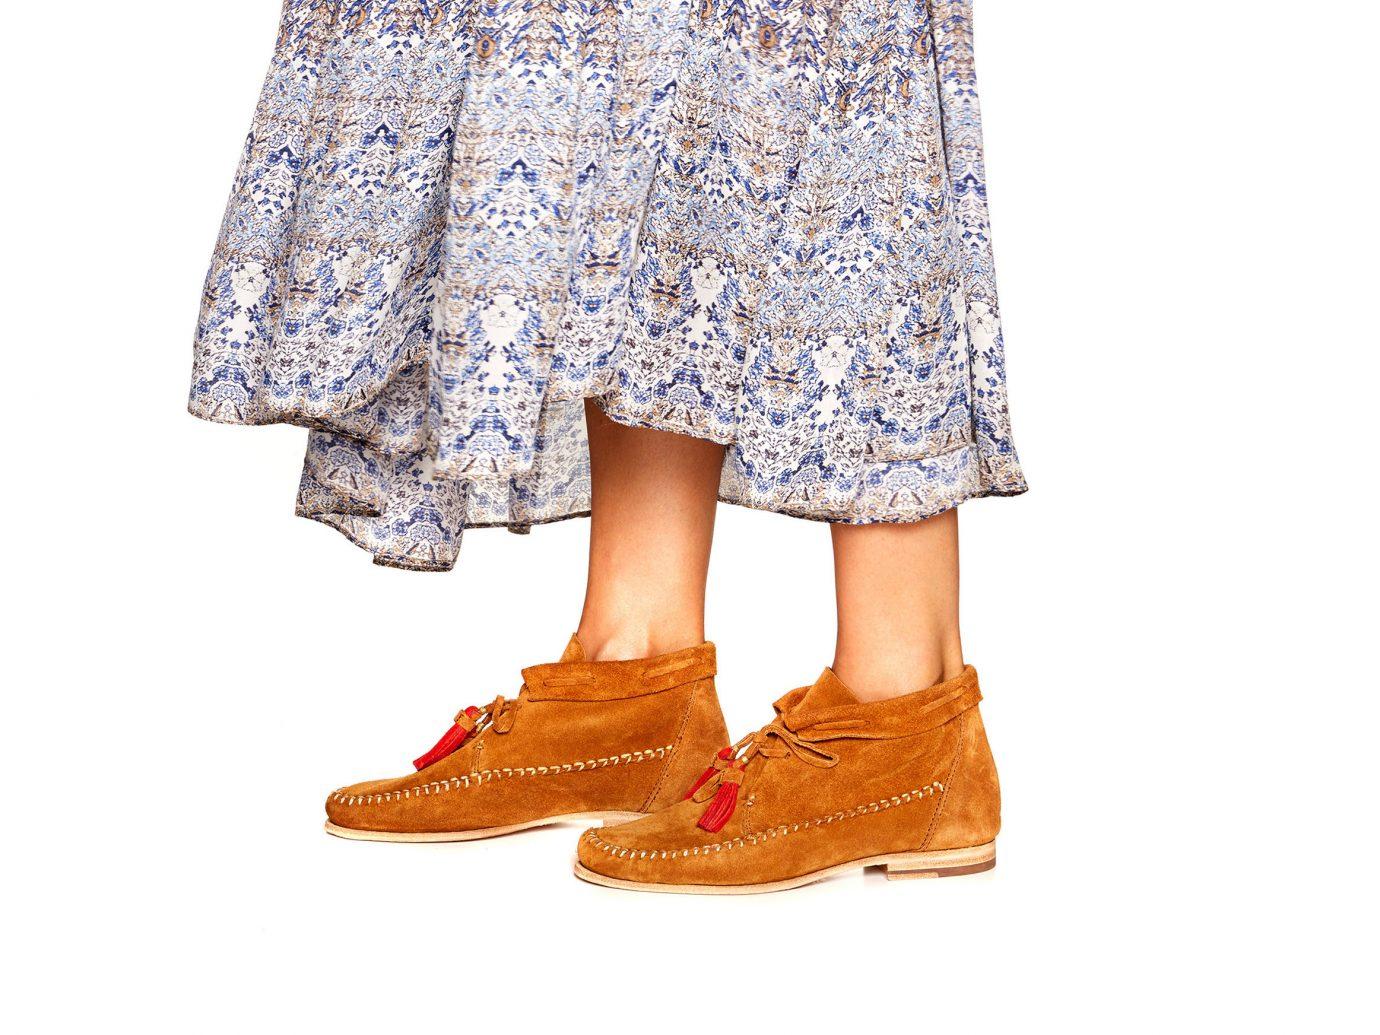 Style + Design footwear clothing pattern shoe boot Design textile abdomen